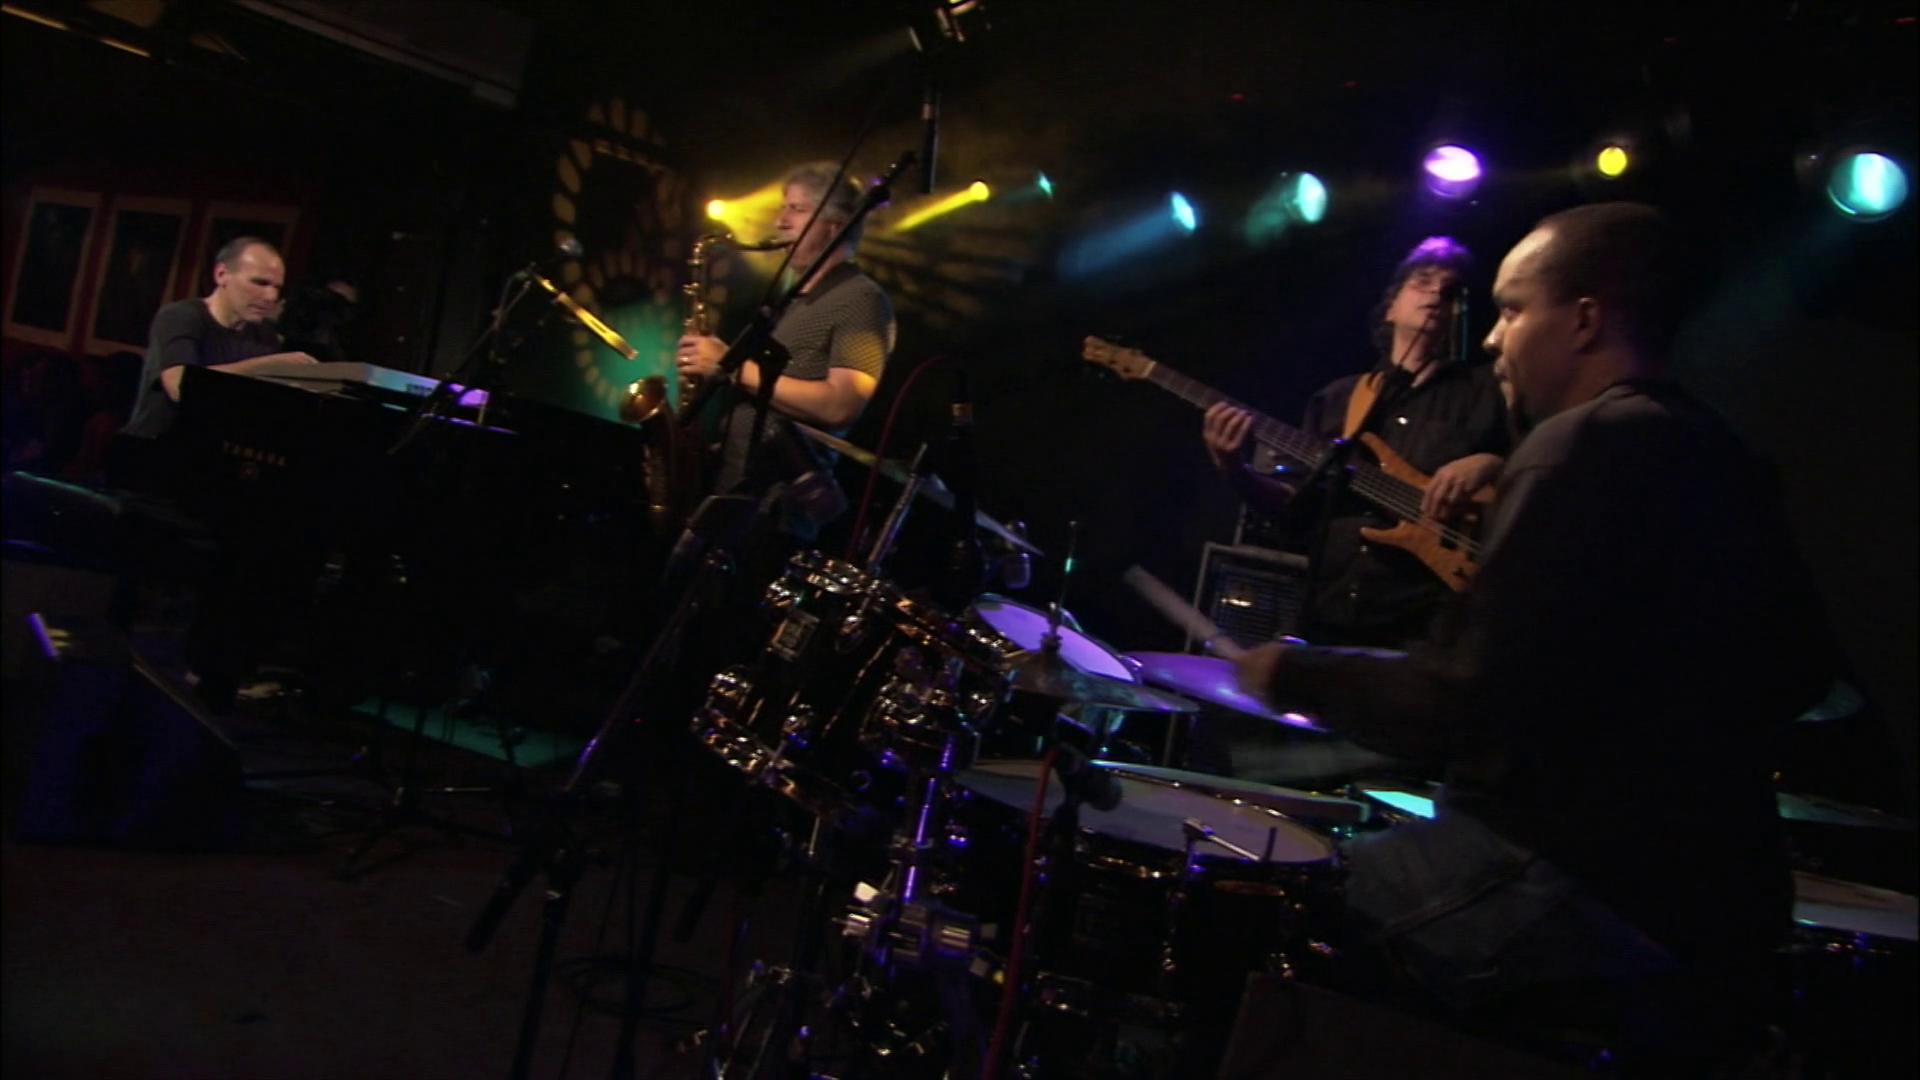 2008 Yellowjackets - New Morning - The Paris Concert [HDTV 1080p] 3